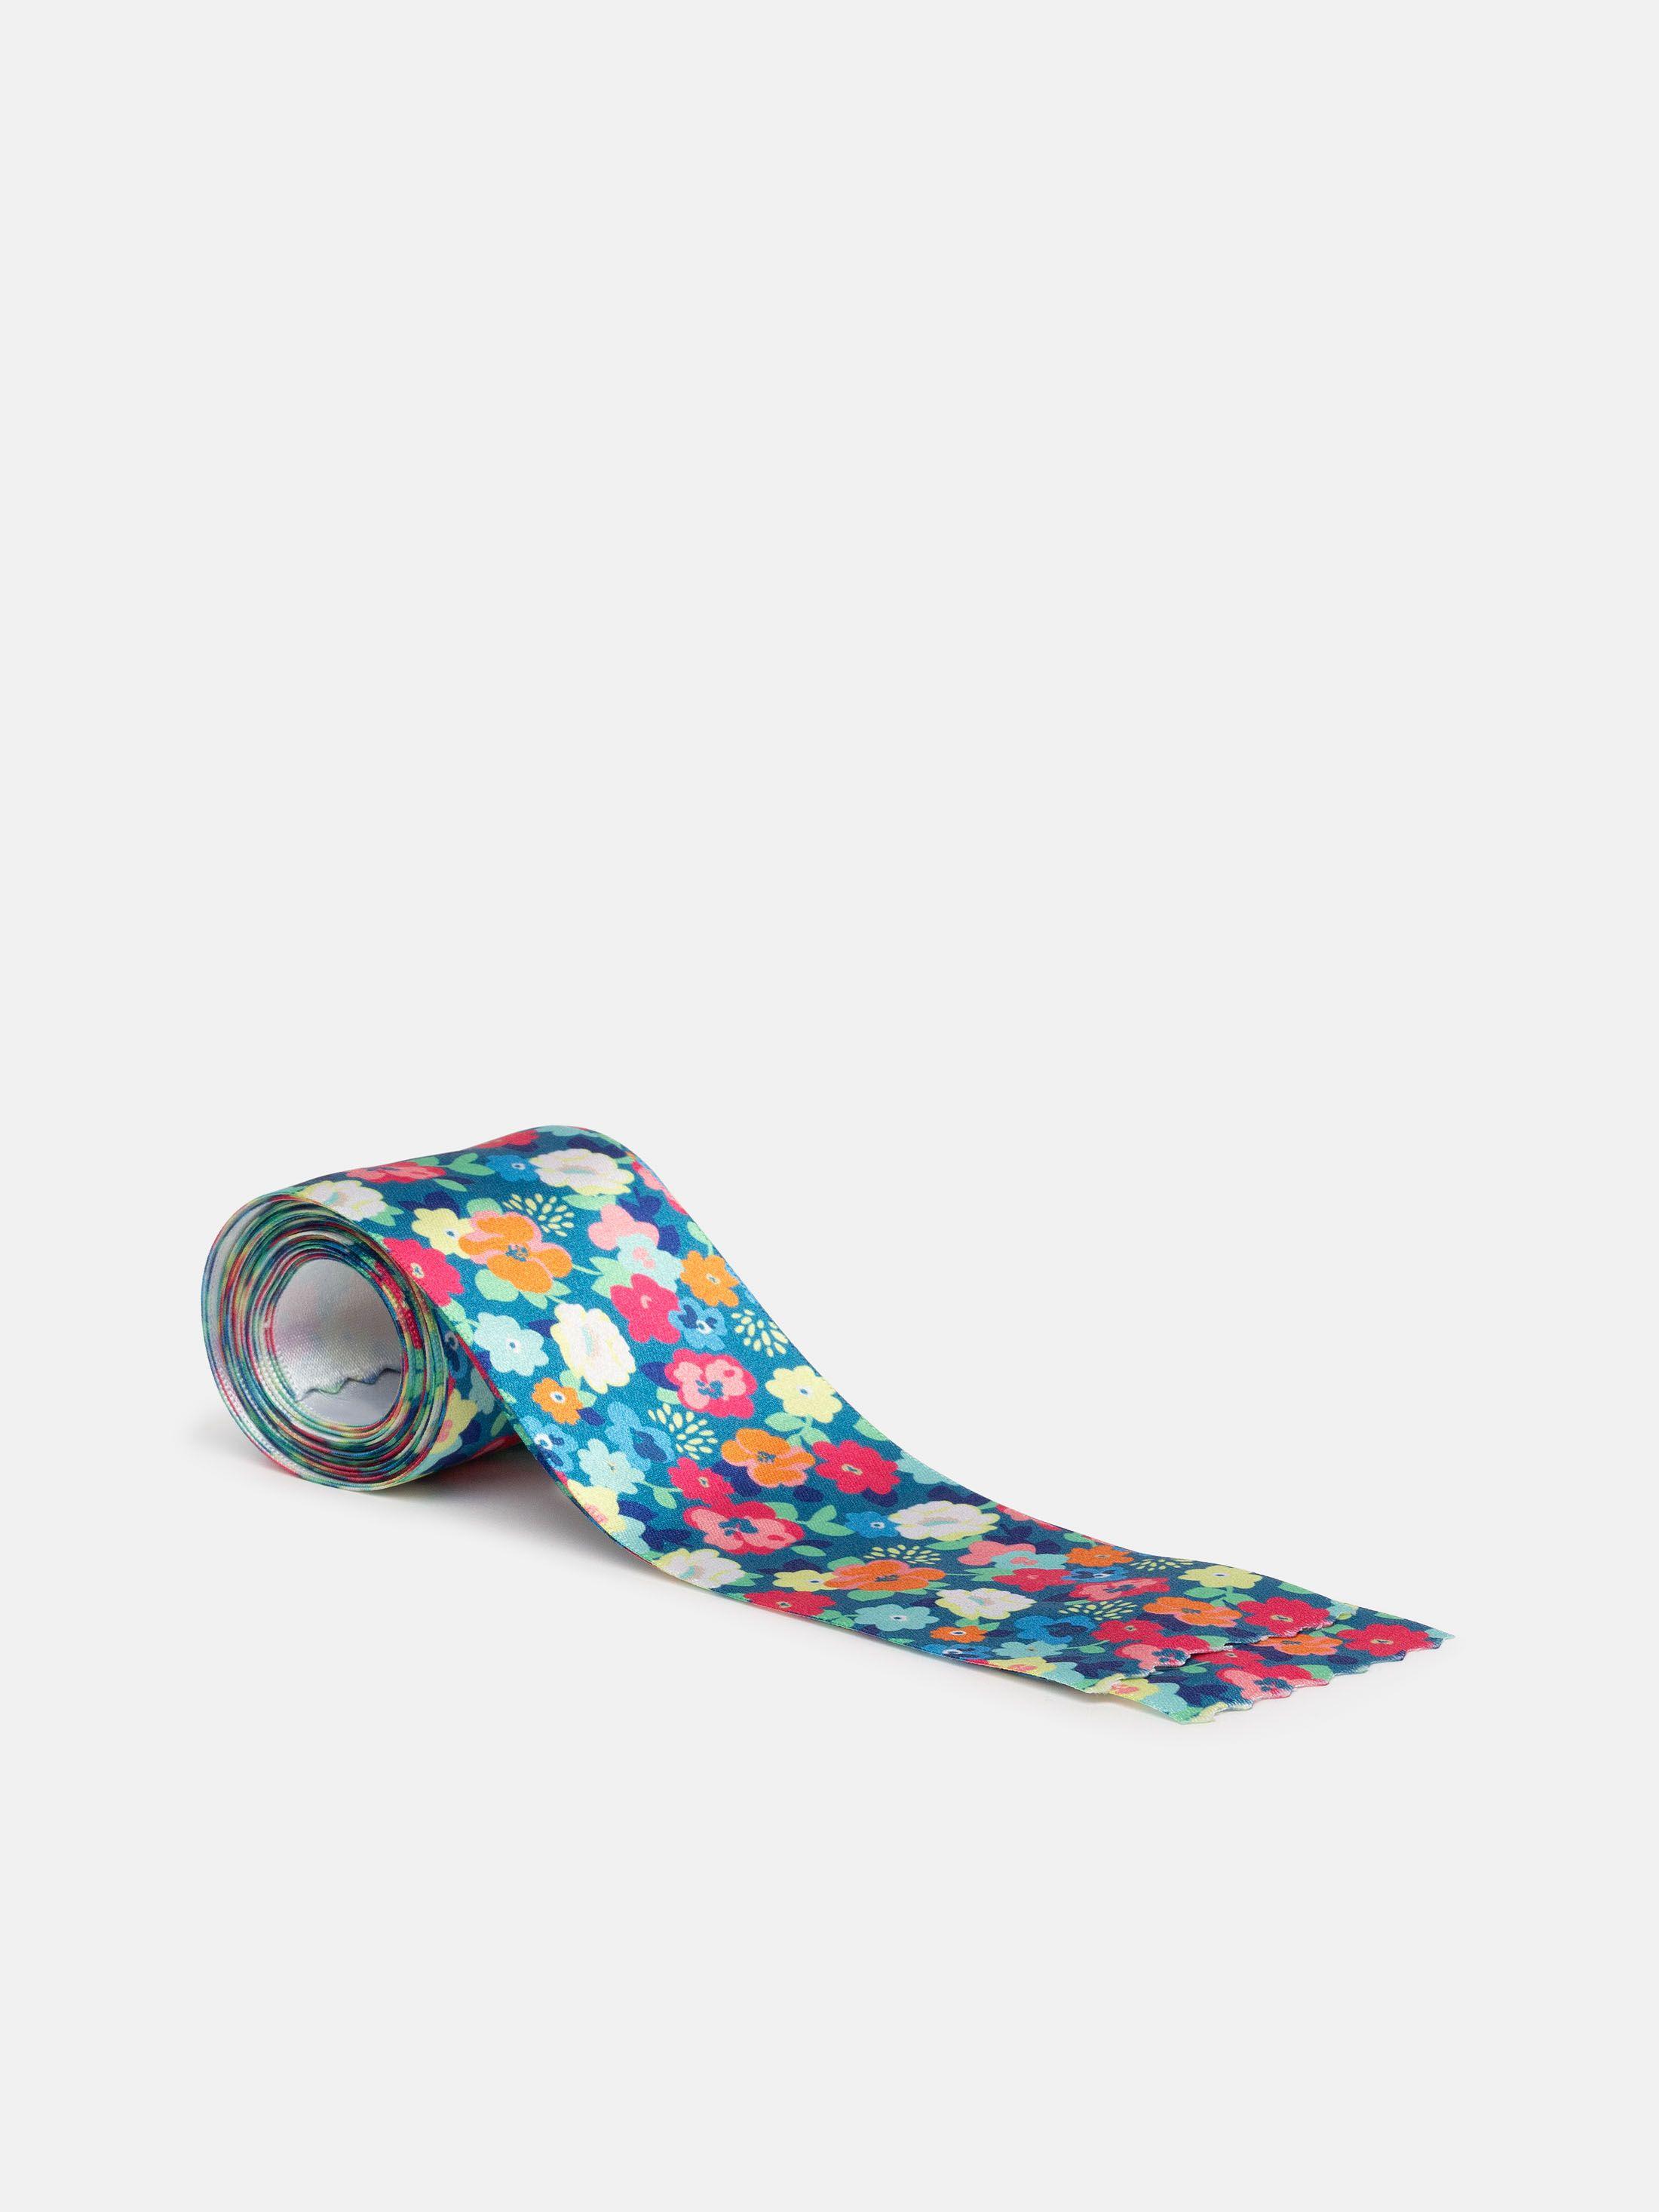 custom printed ribbon with designs or logos